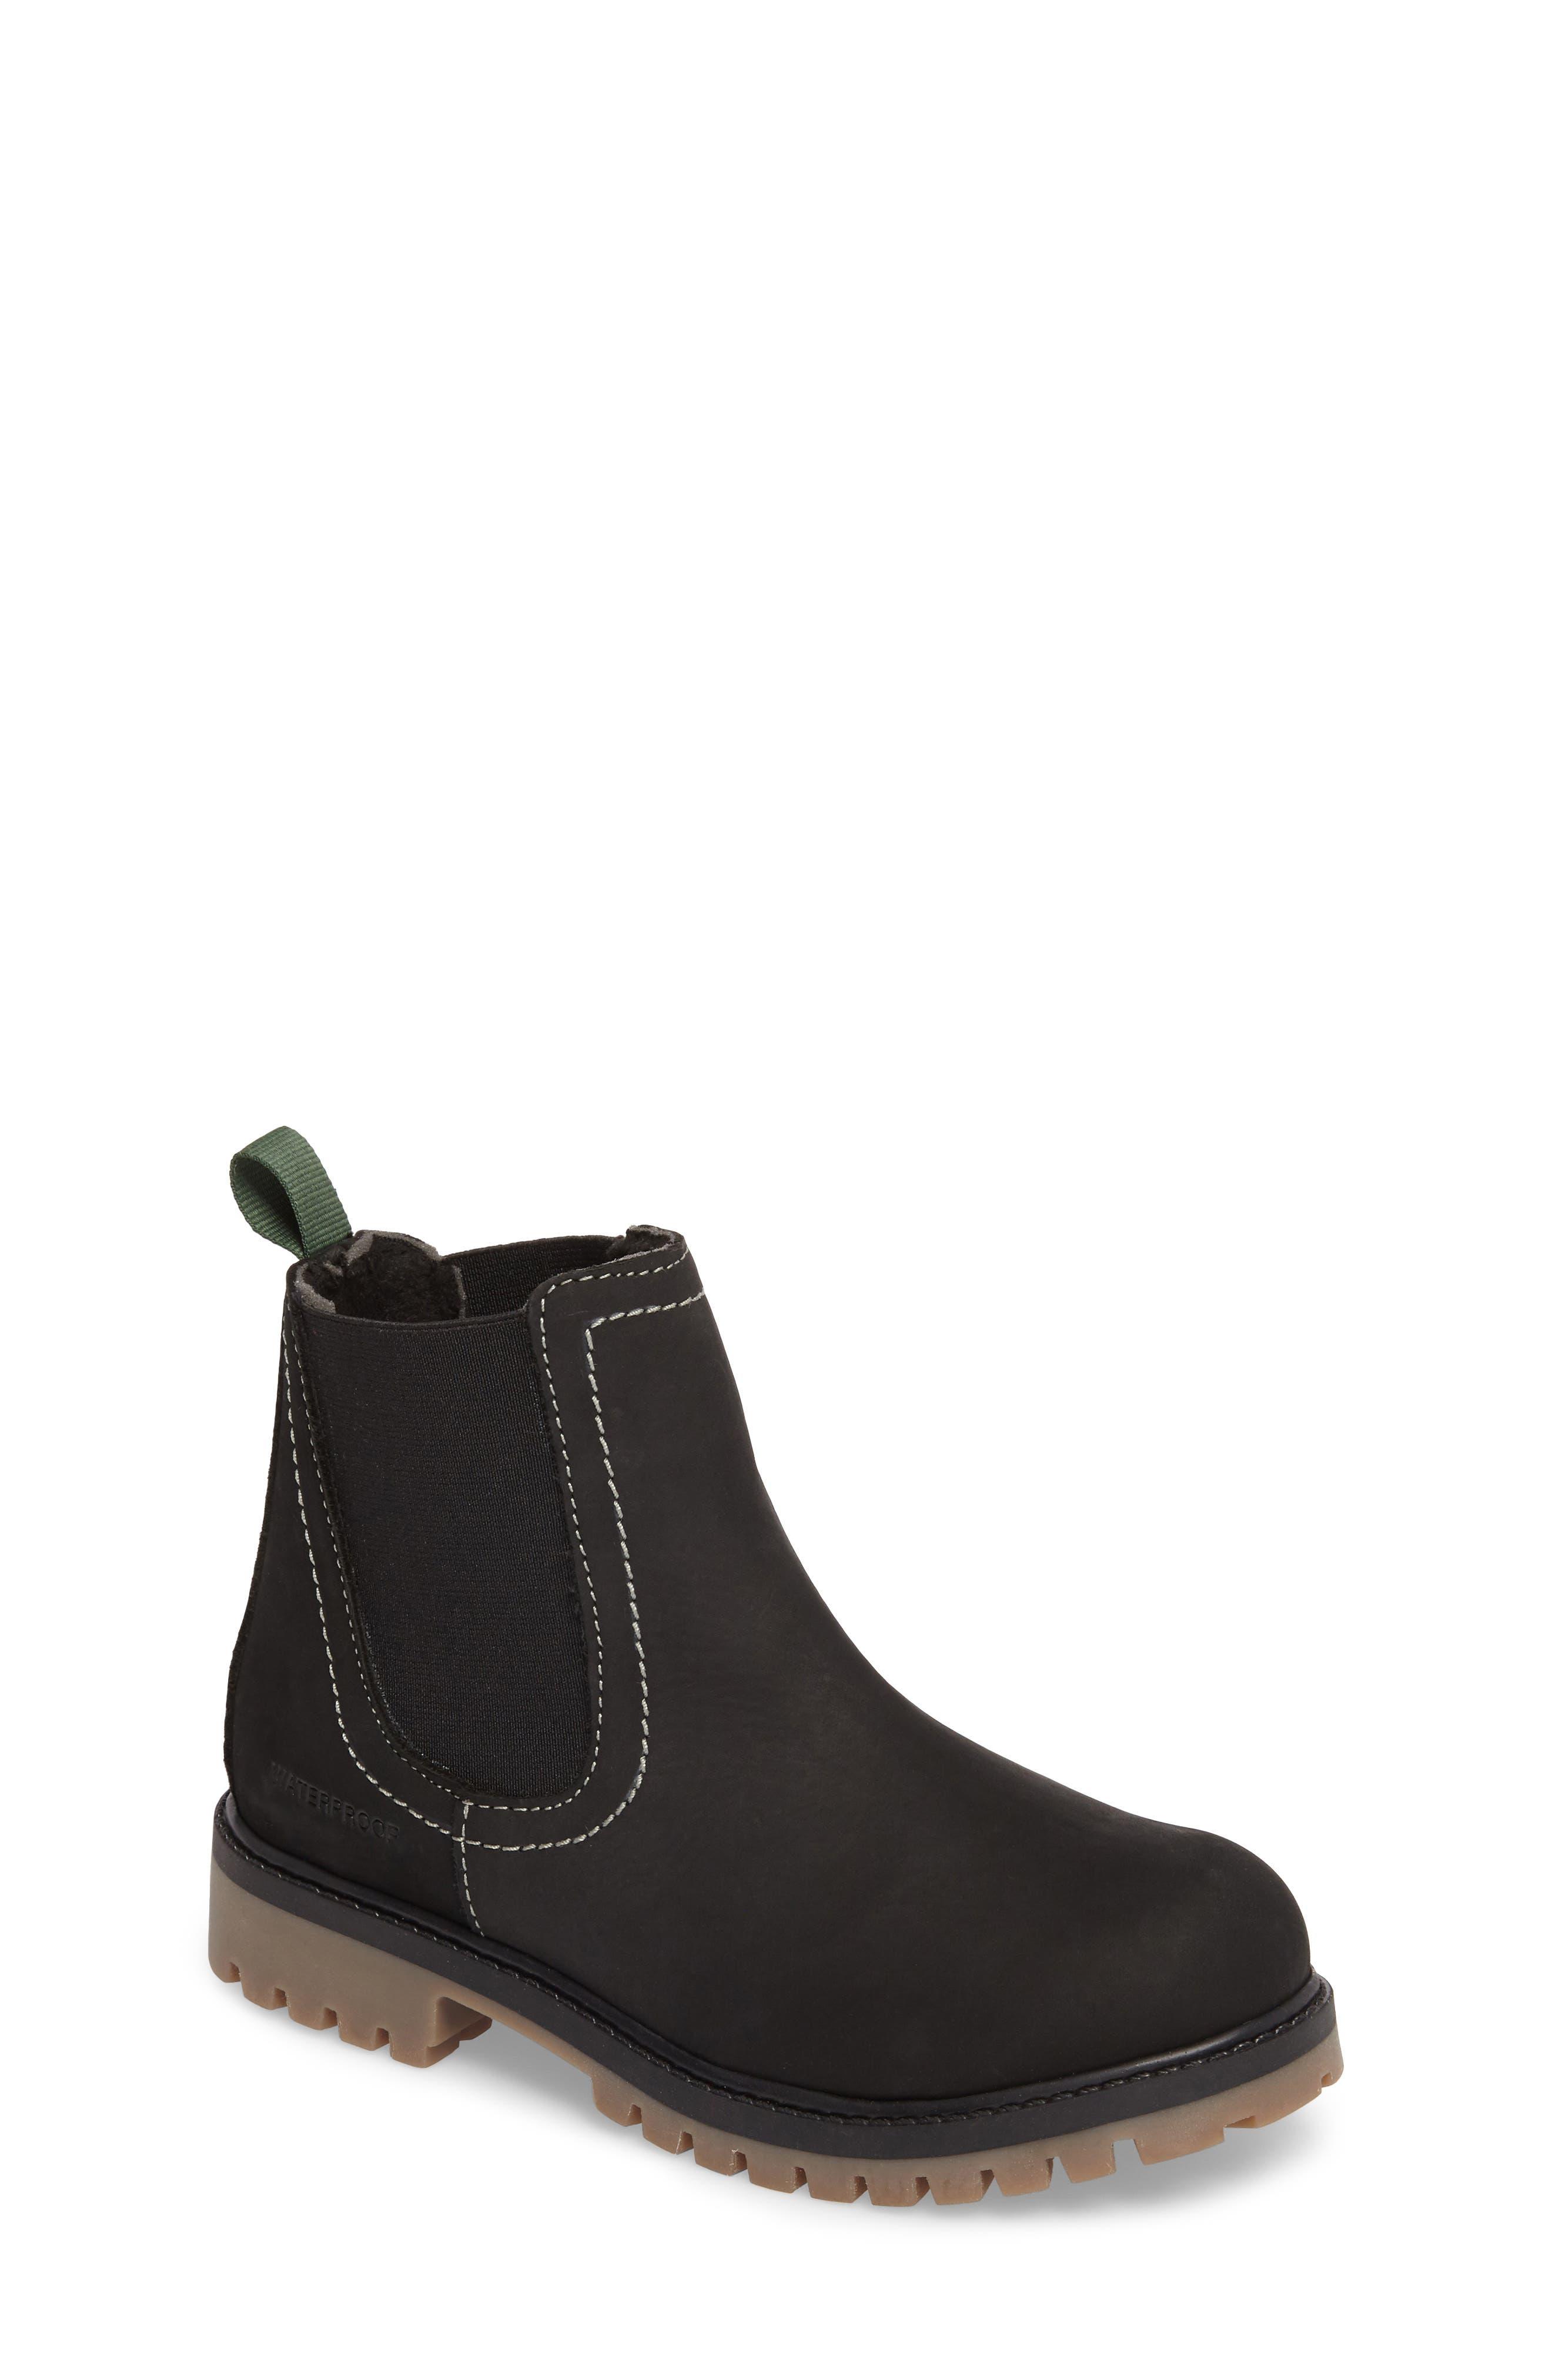 TakodaC Waterproof Chelsea Boot, Main, color, 010